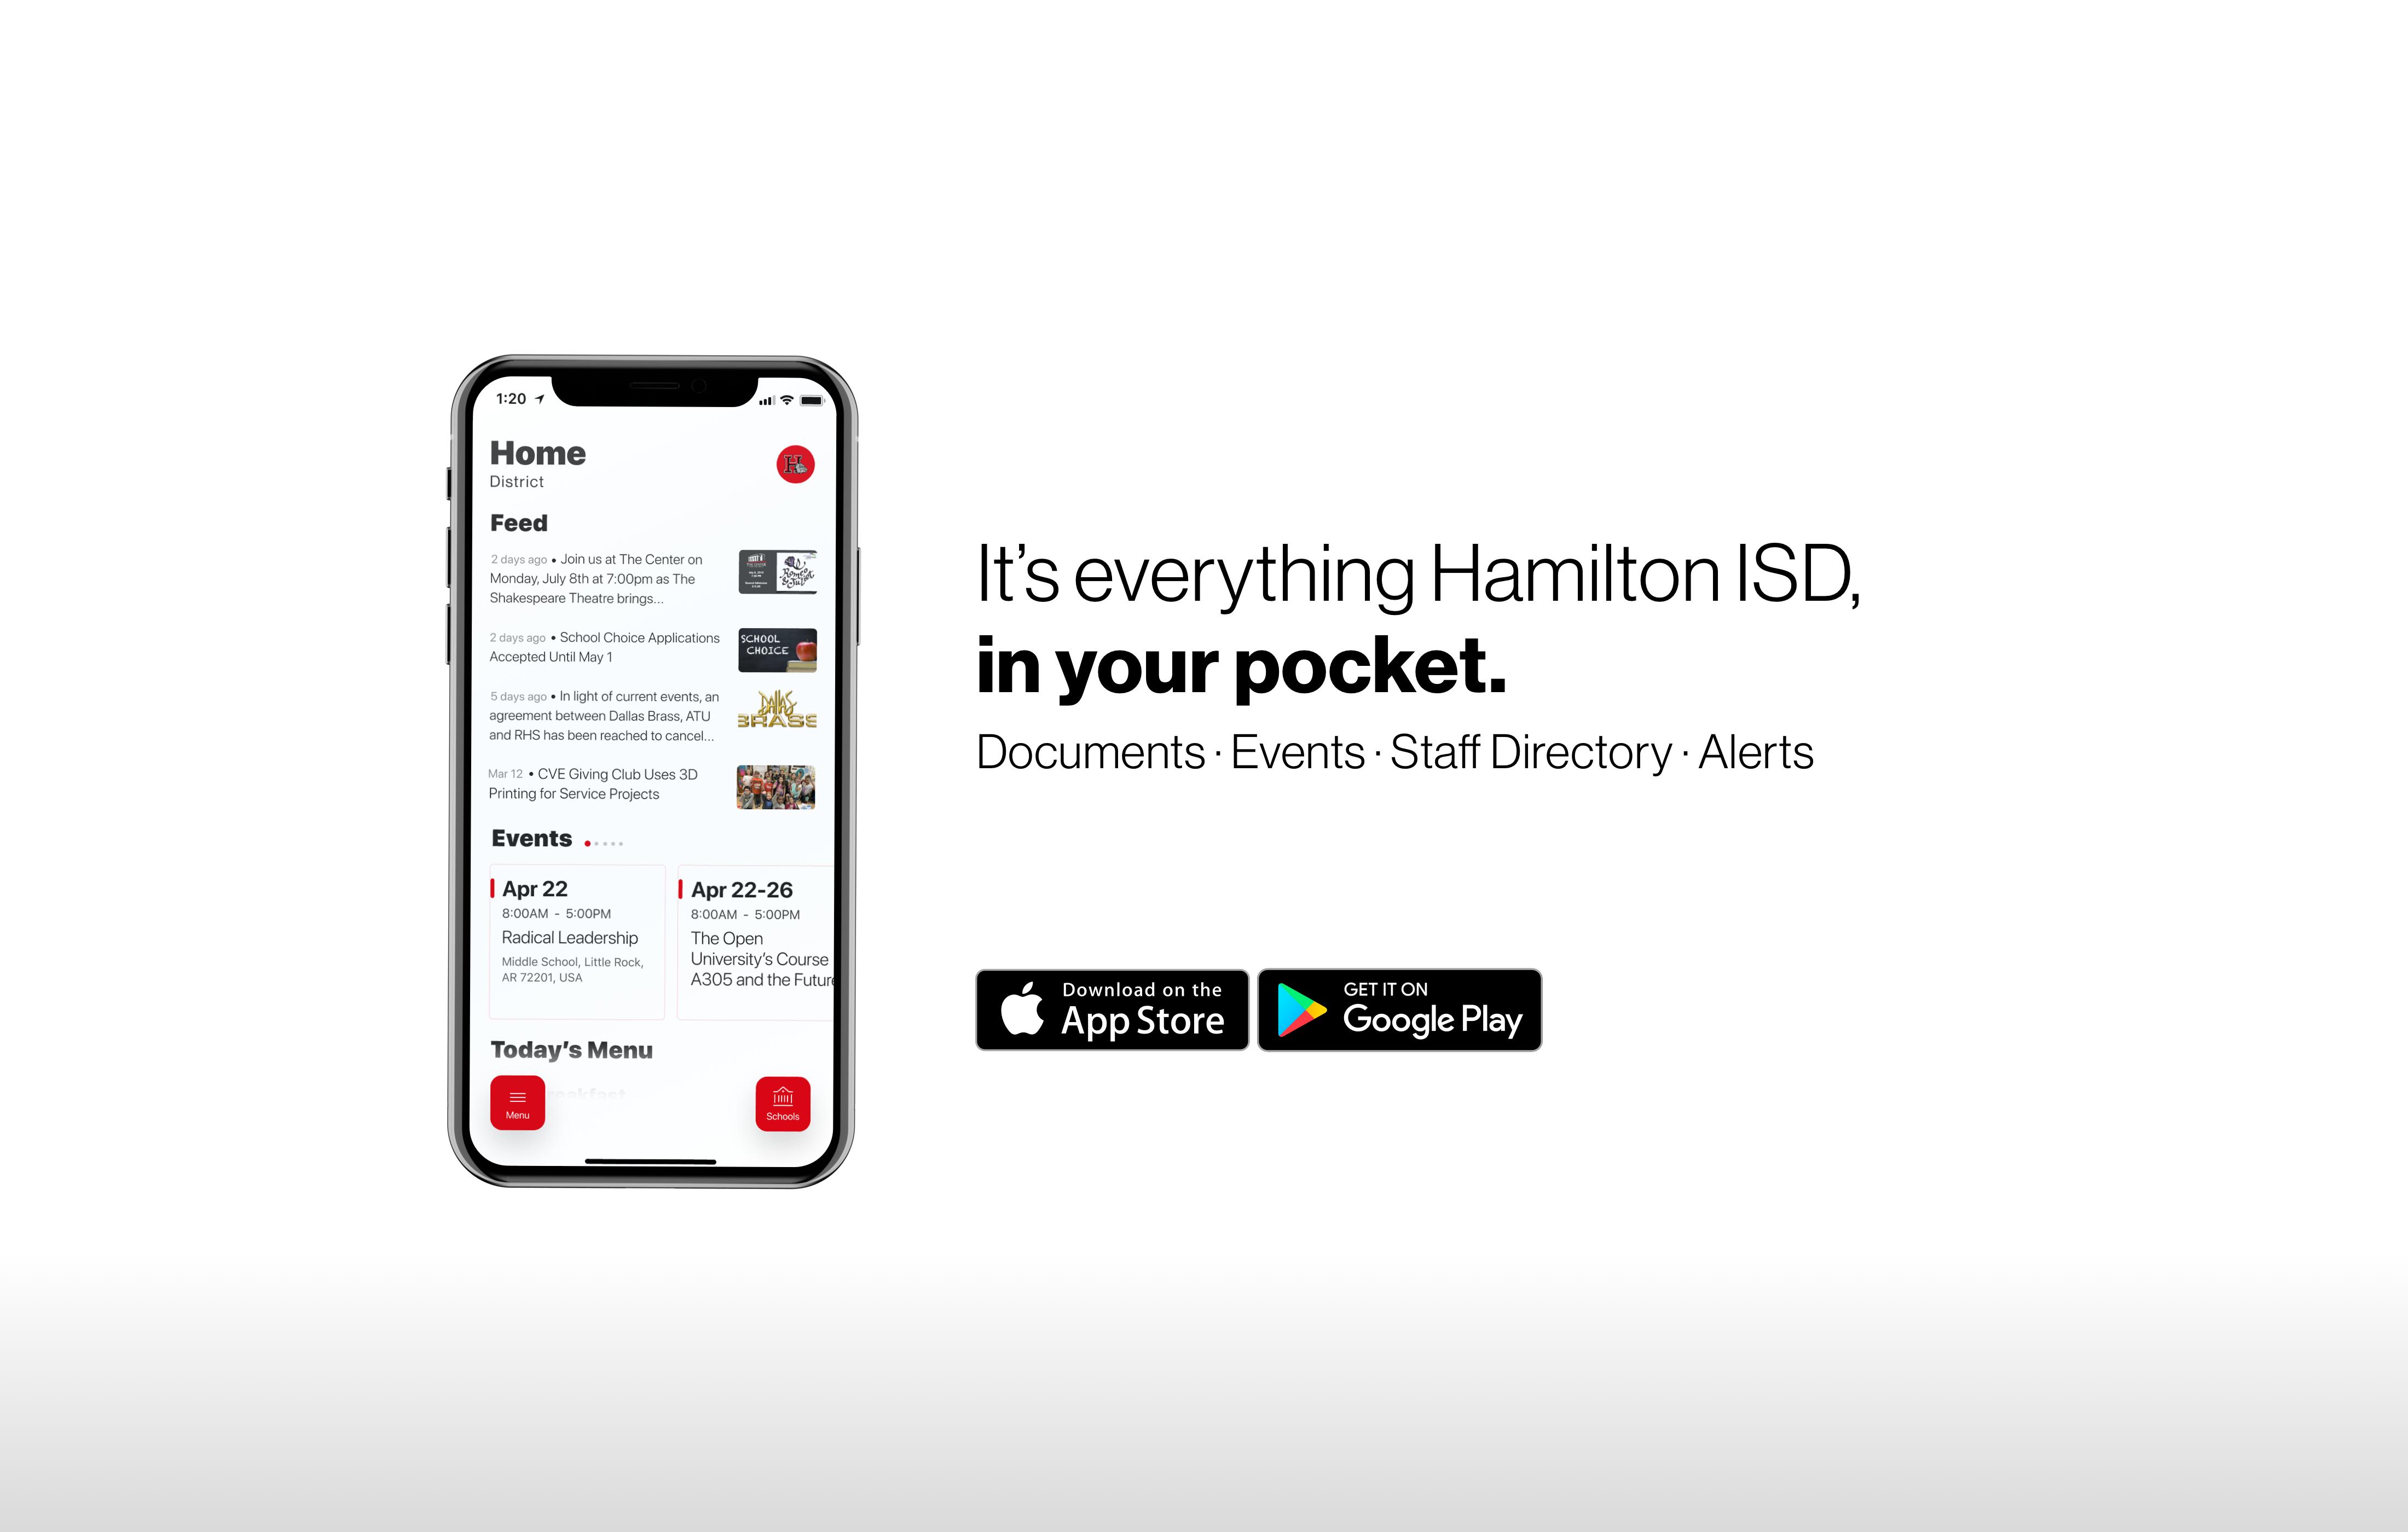 HISD App